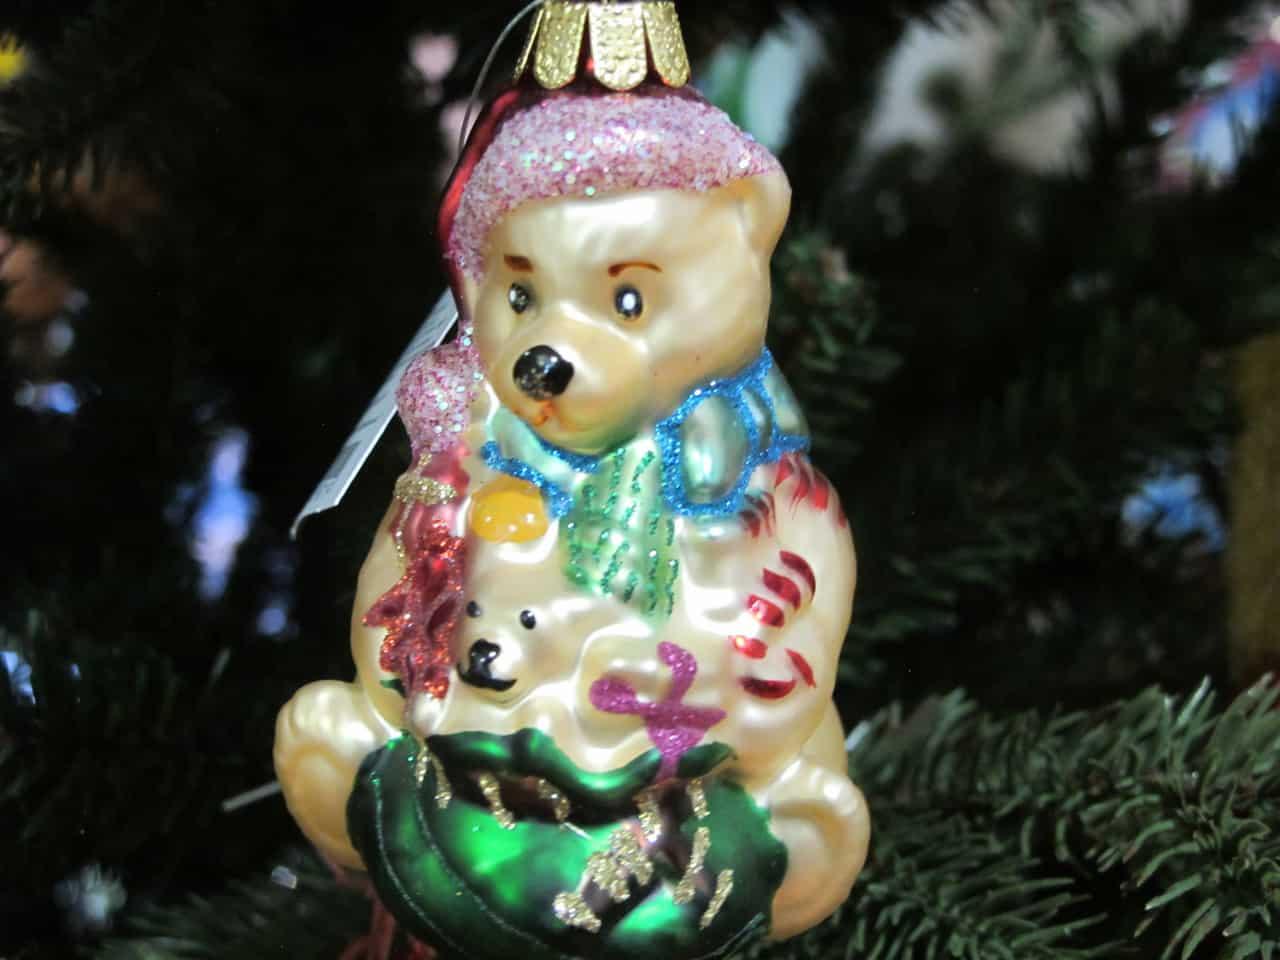 Хрупкое чудо на новогодней елке Хрупкое чудо на новогодней елке 3 20